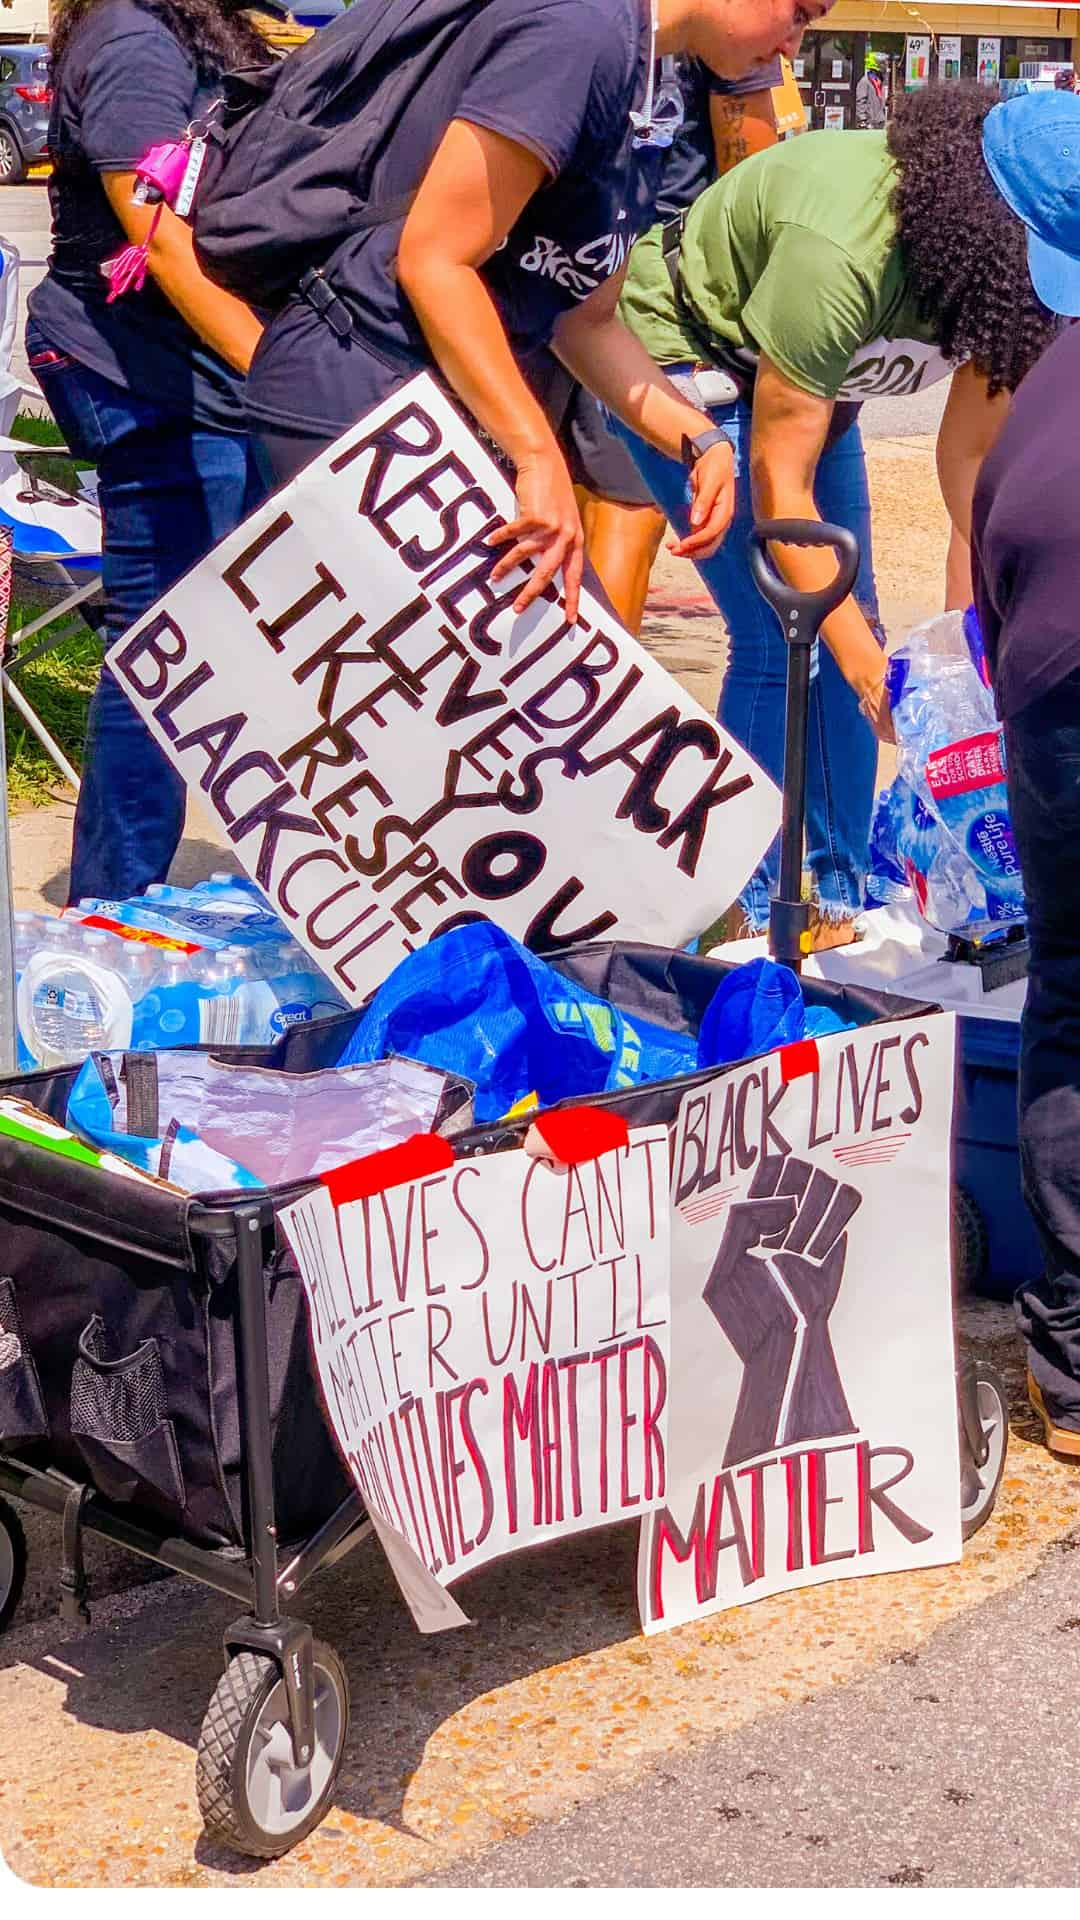 respect Black lives like you respect Black culture protest sign